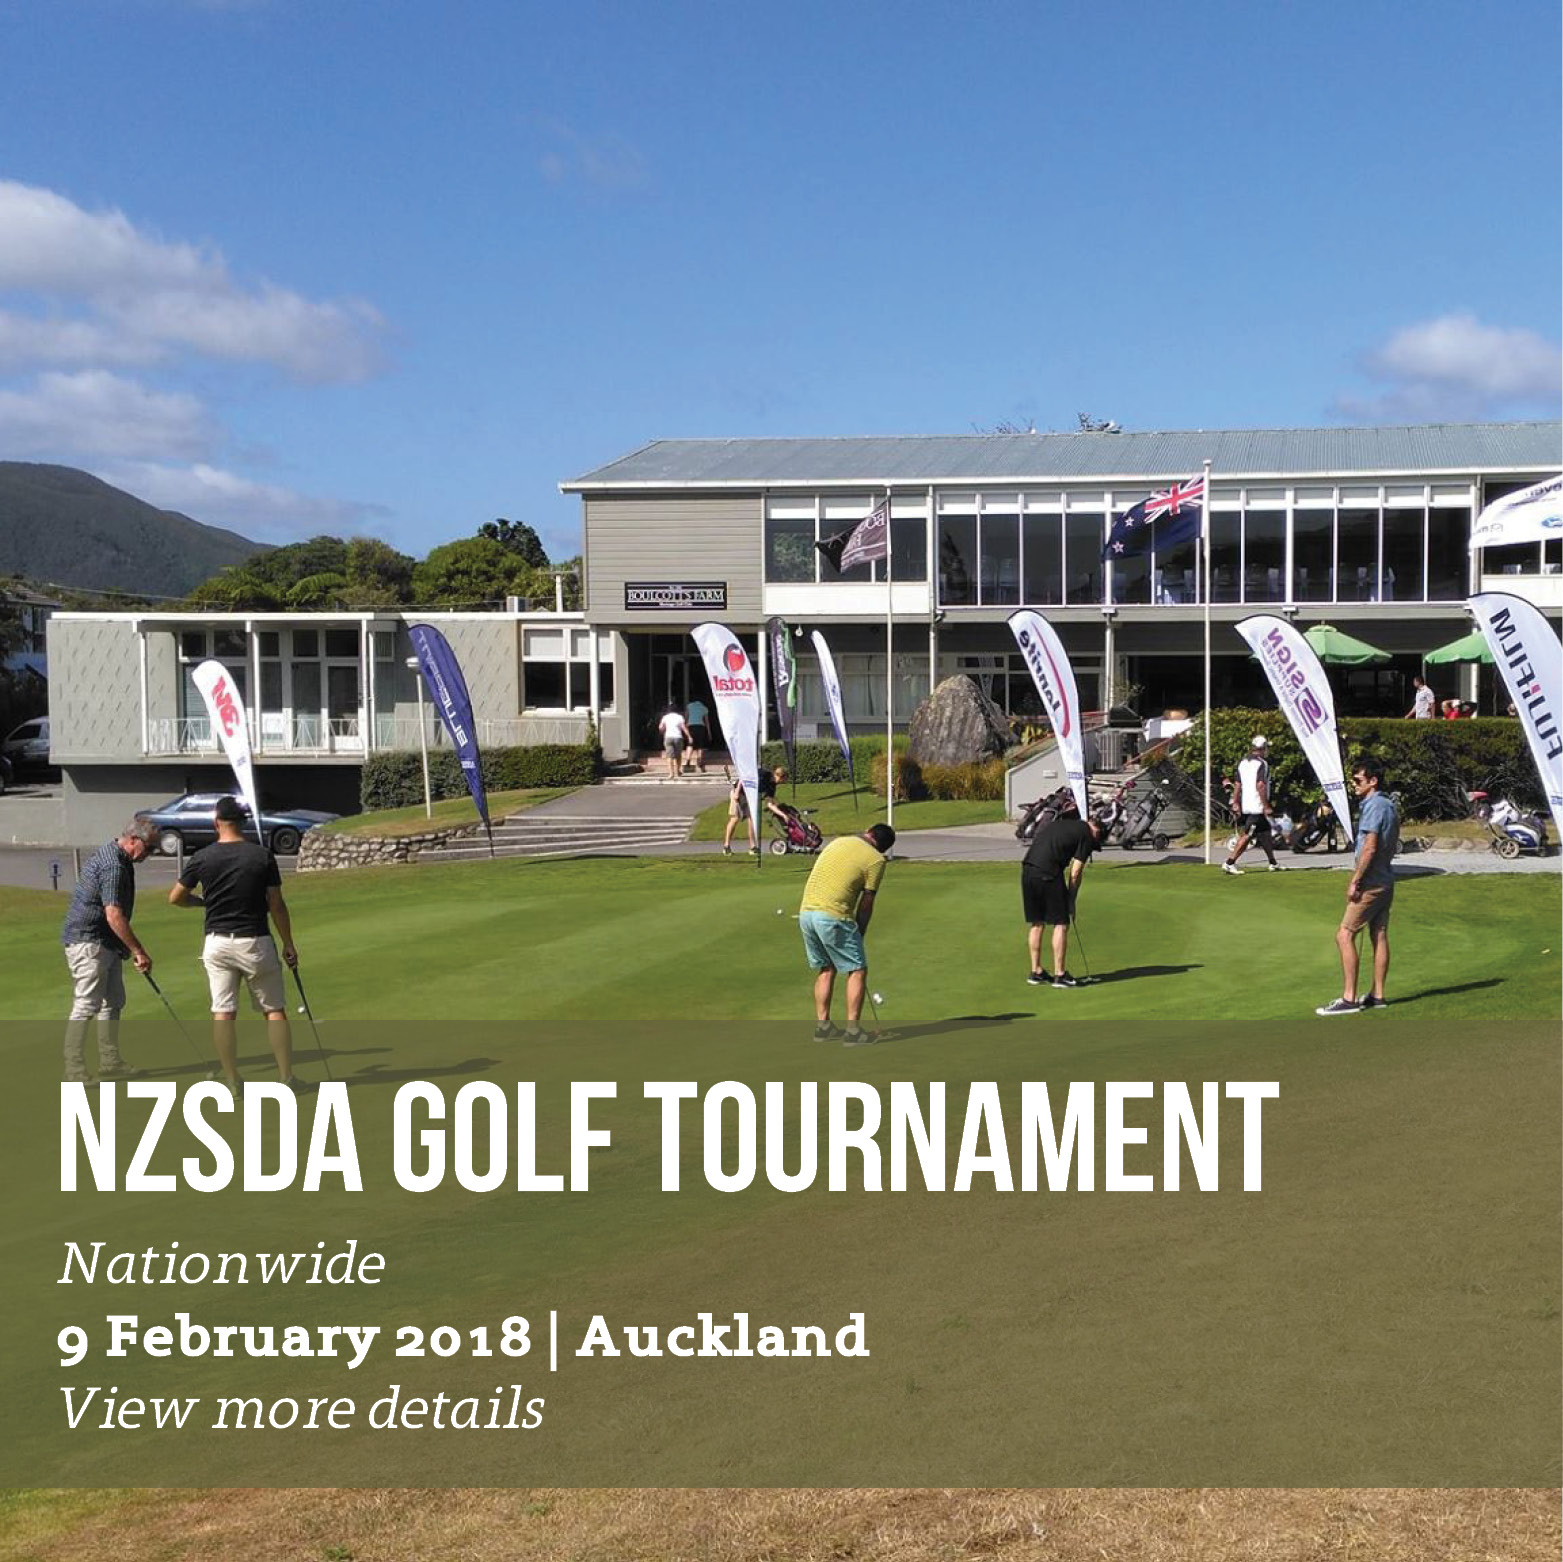 NZSDA Golf Tournament